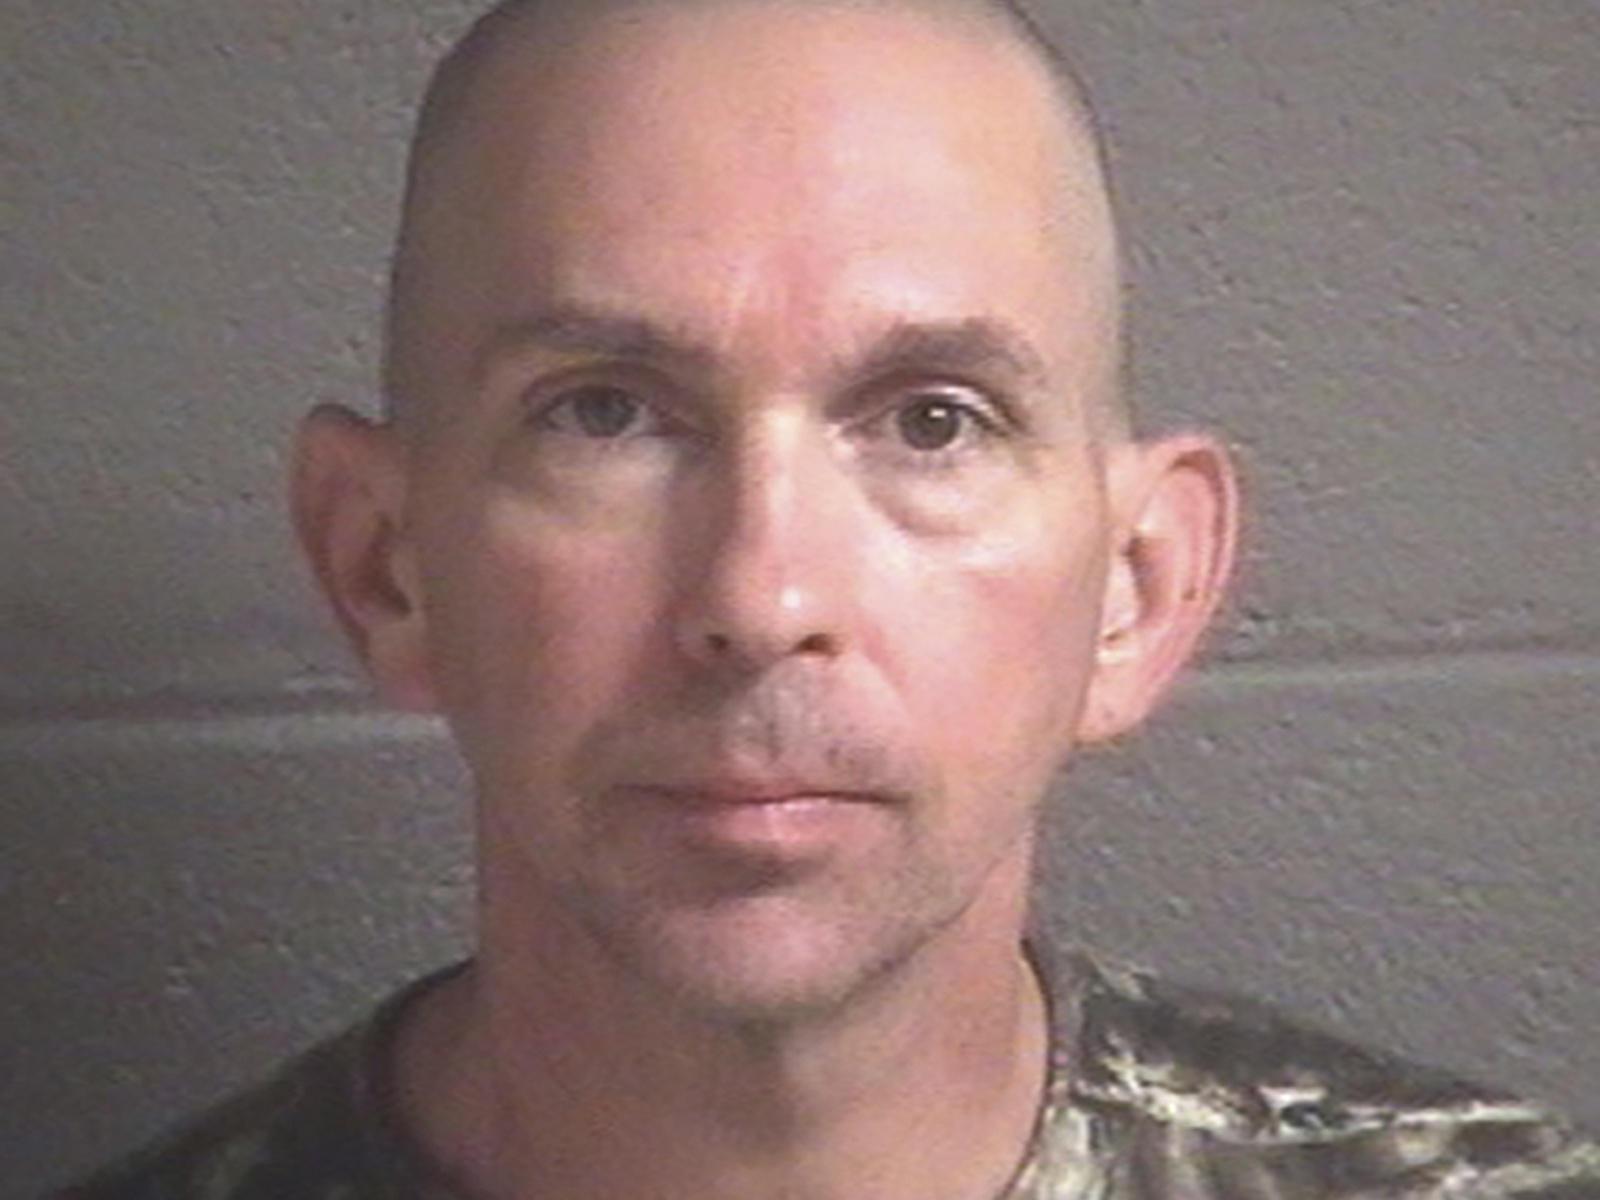 Man who left bomb at N Carolina airport freed days earlier